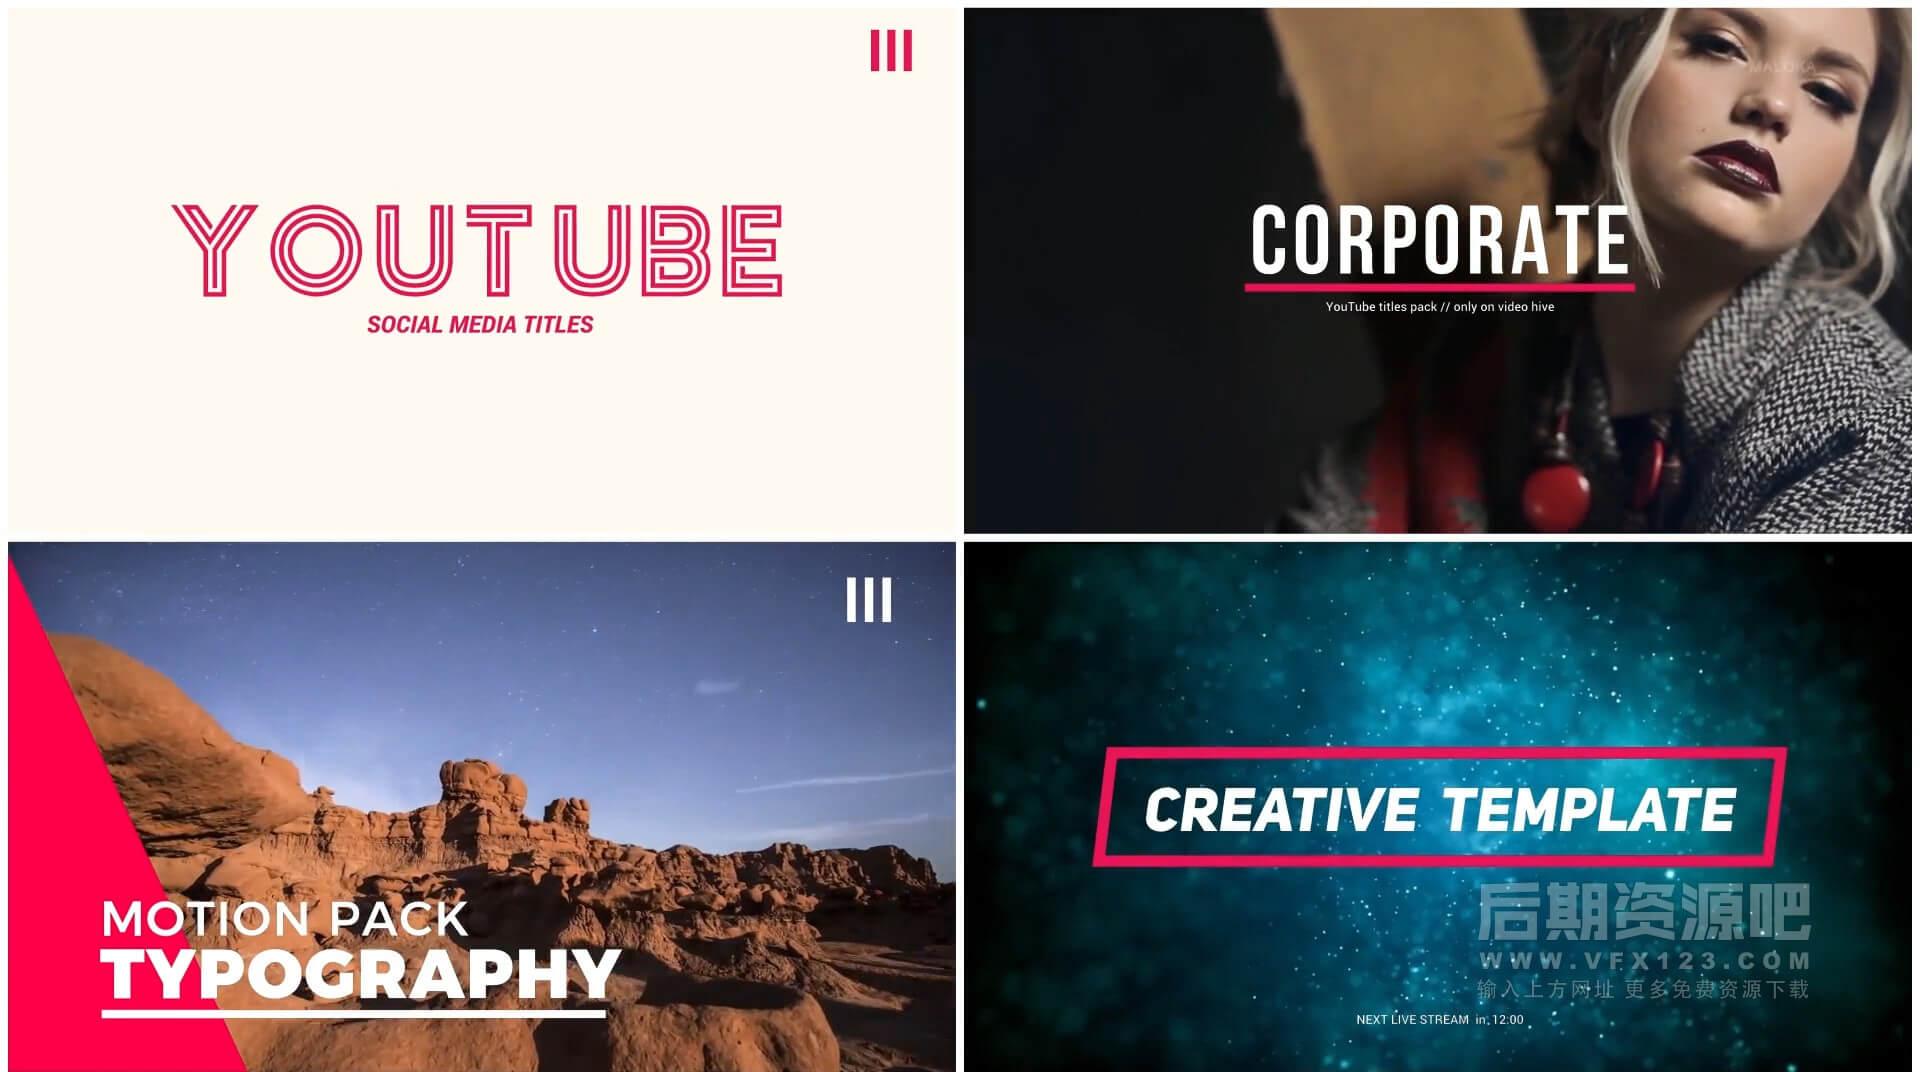 FCPX插件 30组大标题自媒体栏目包装模板 YouTube Titles Pro